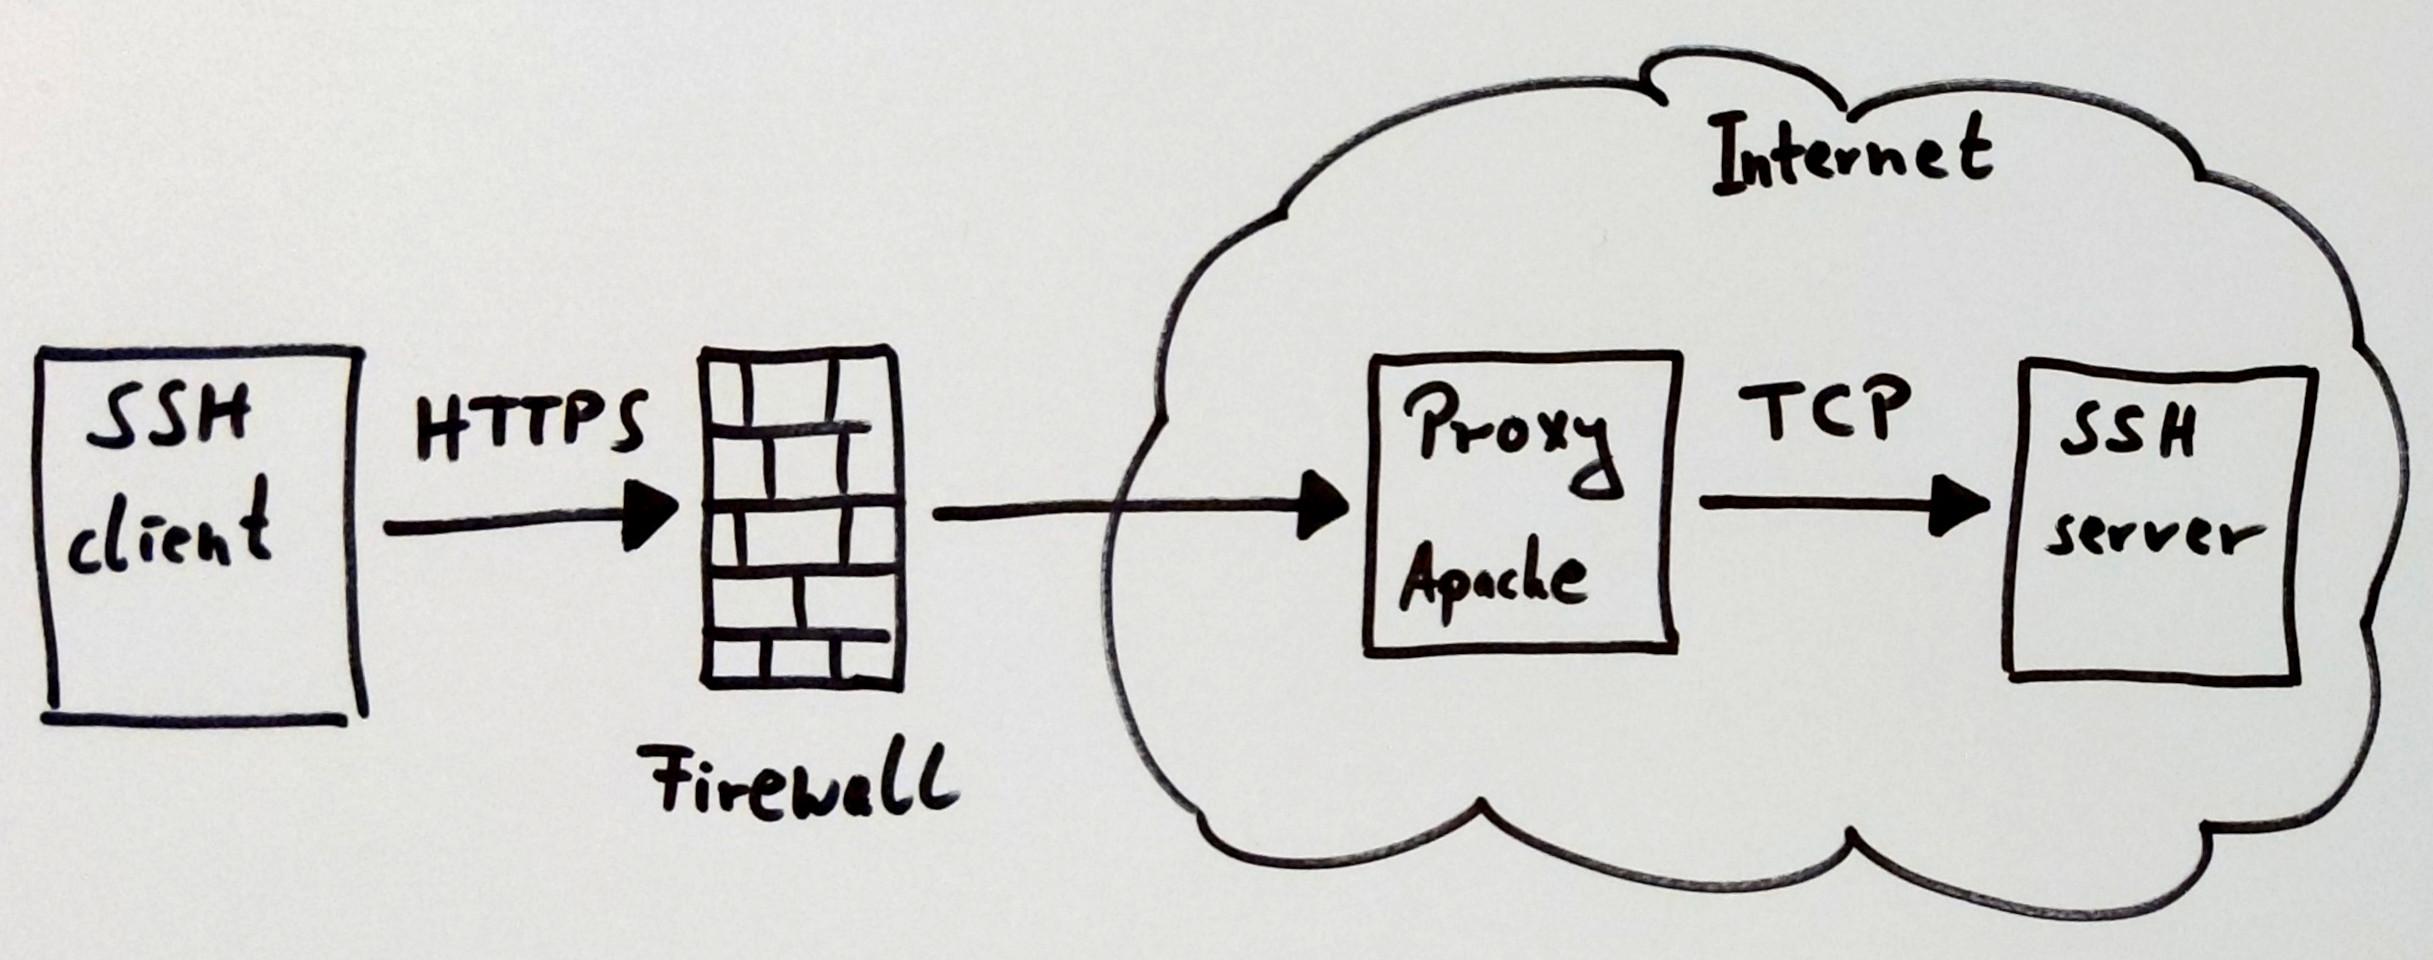 proxy tunnel connection schema